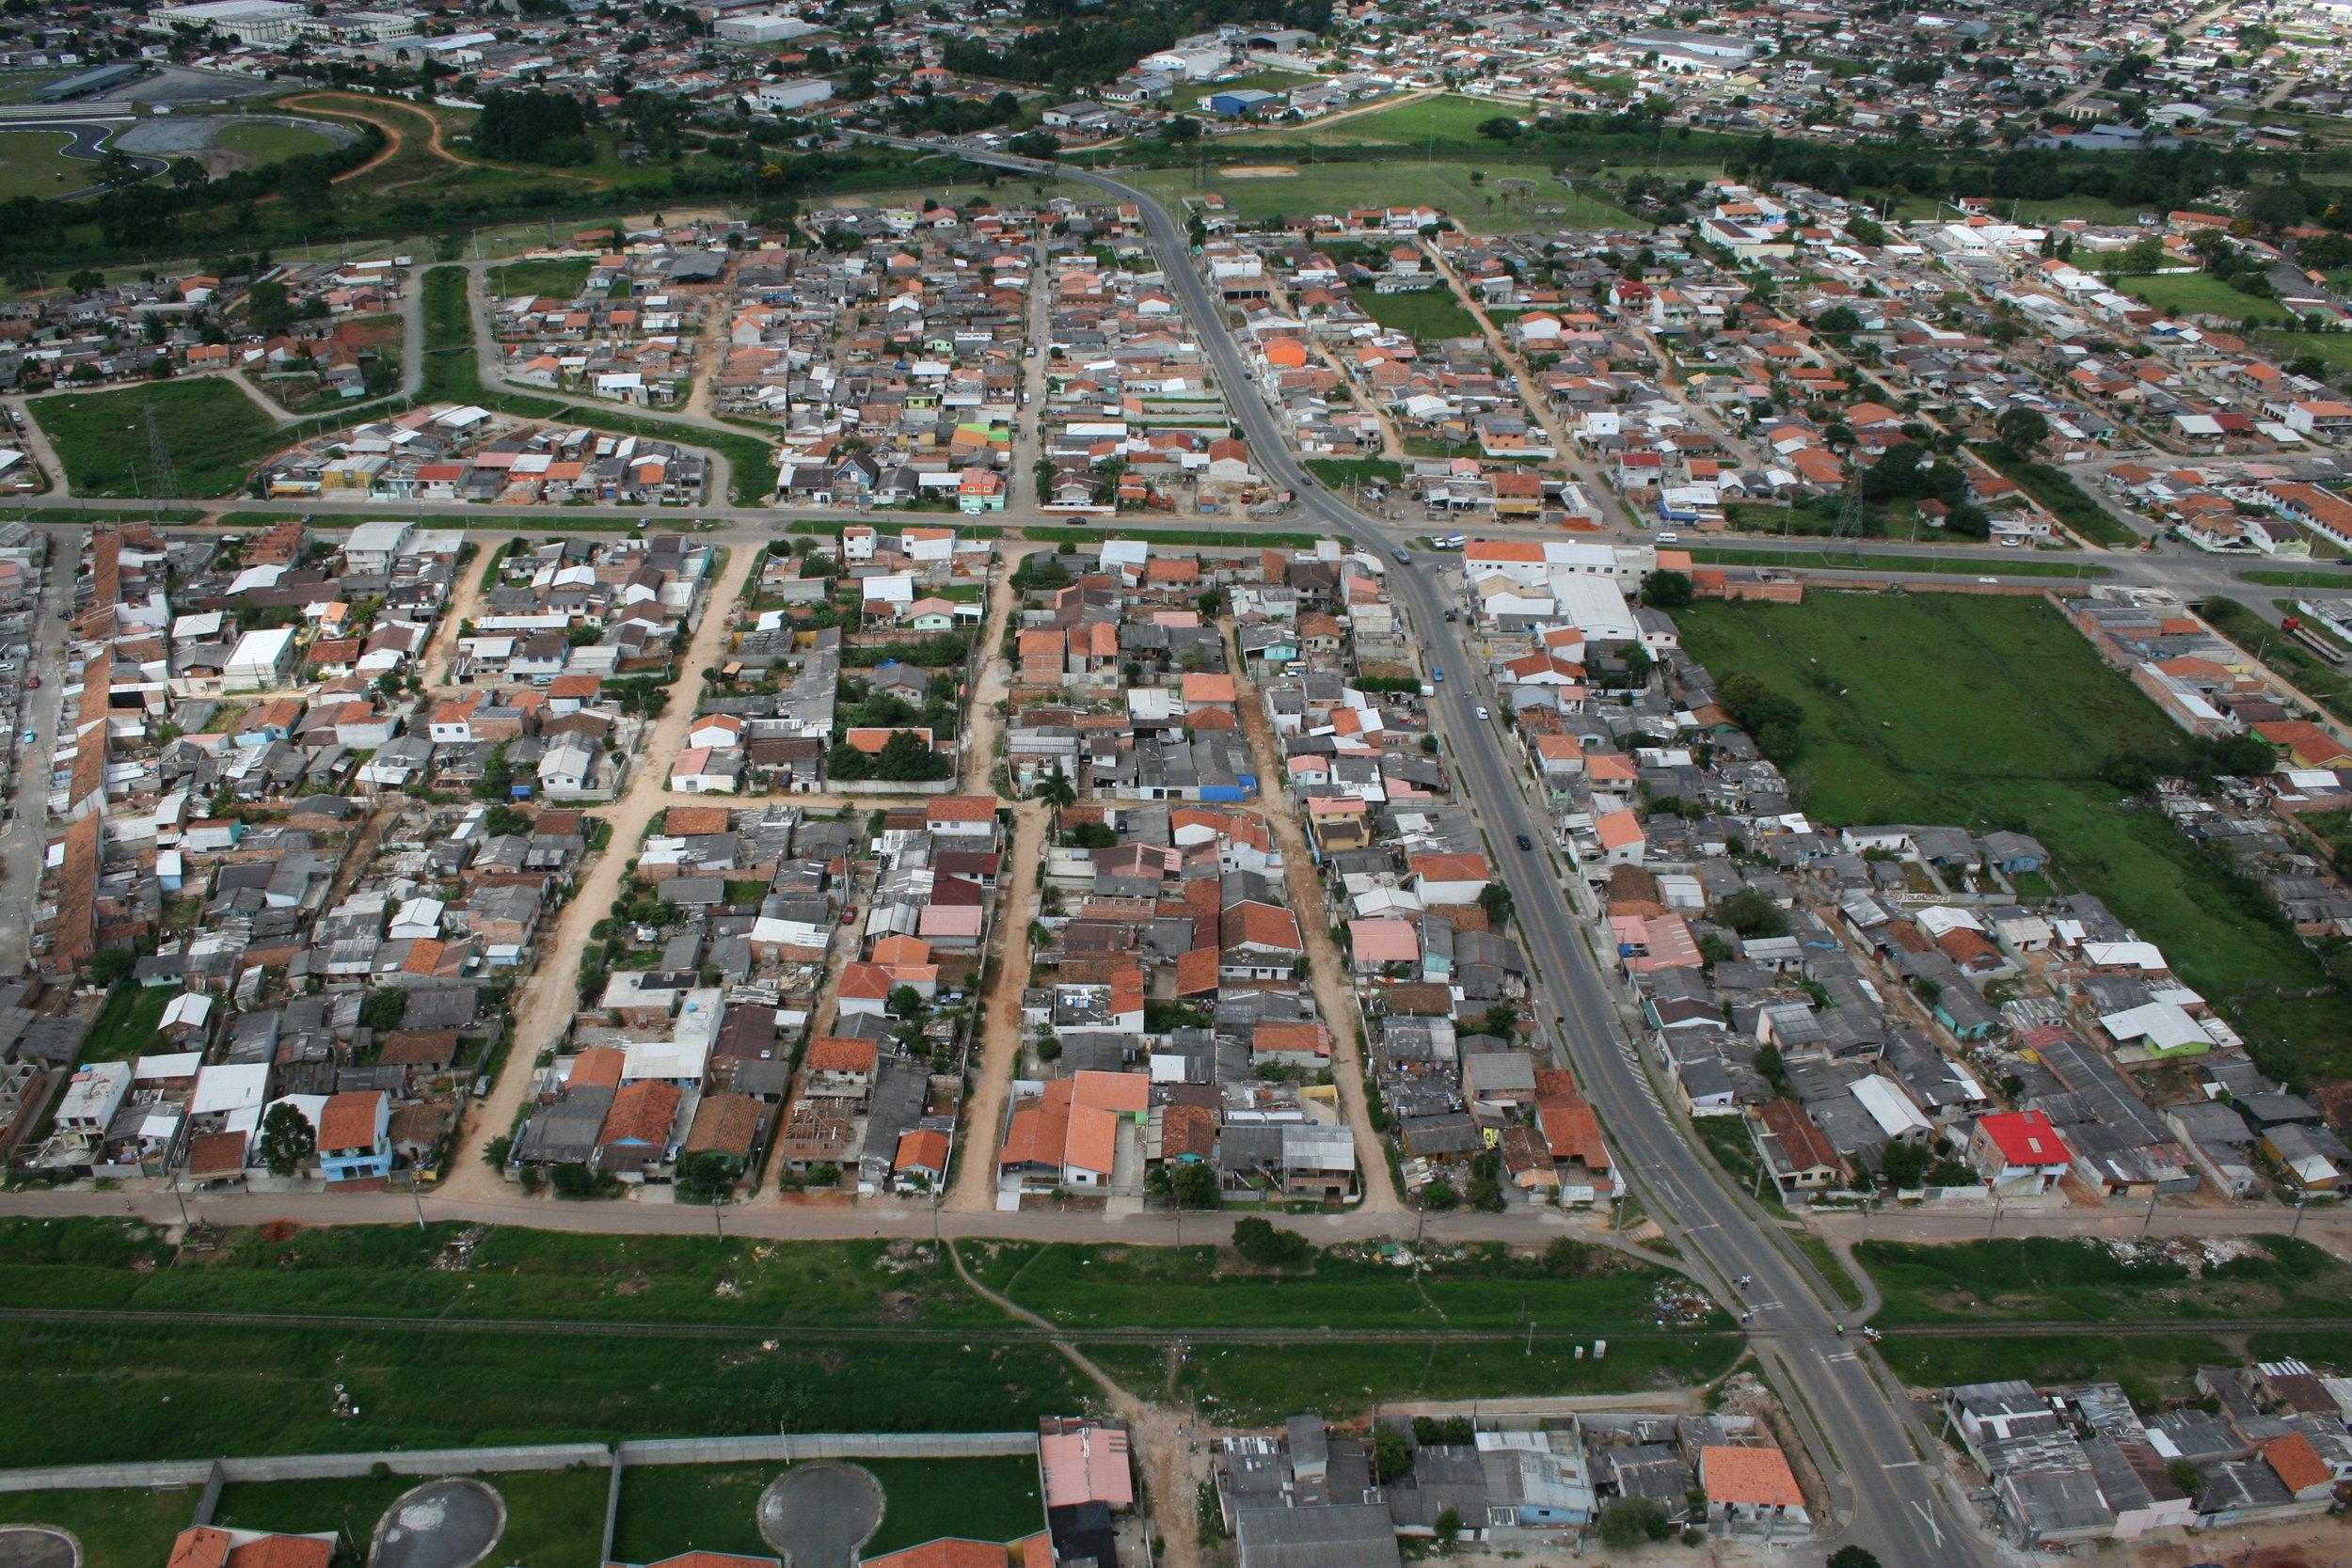 Fotos aéreas 2008 bairro Cajuru (7).jpg